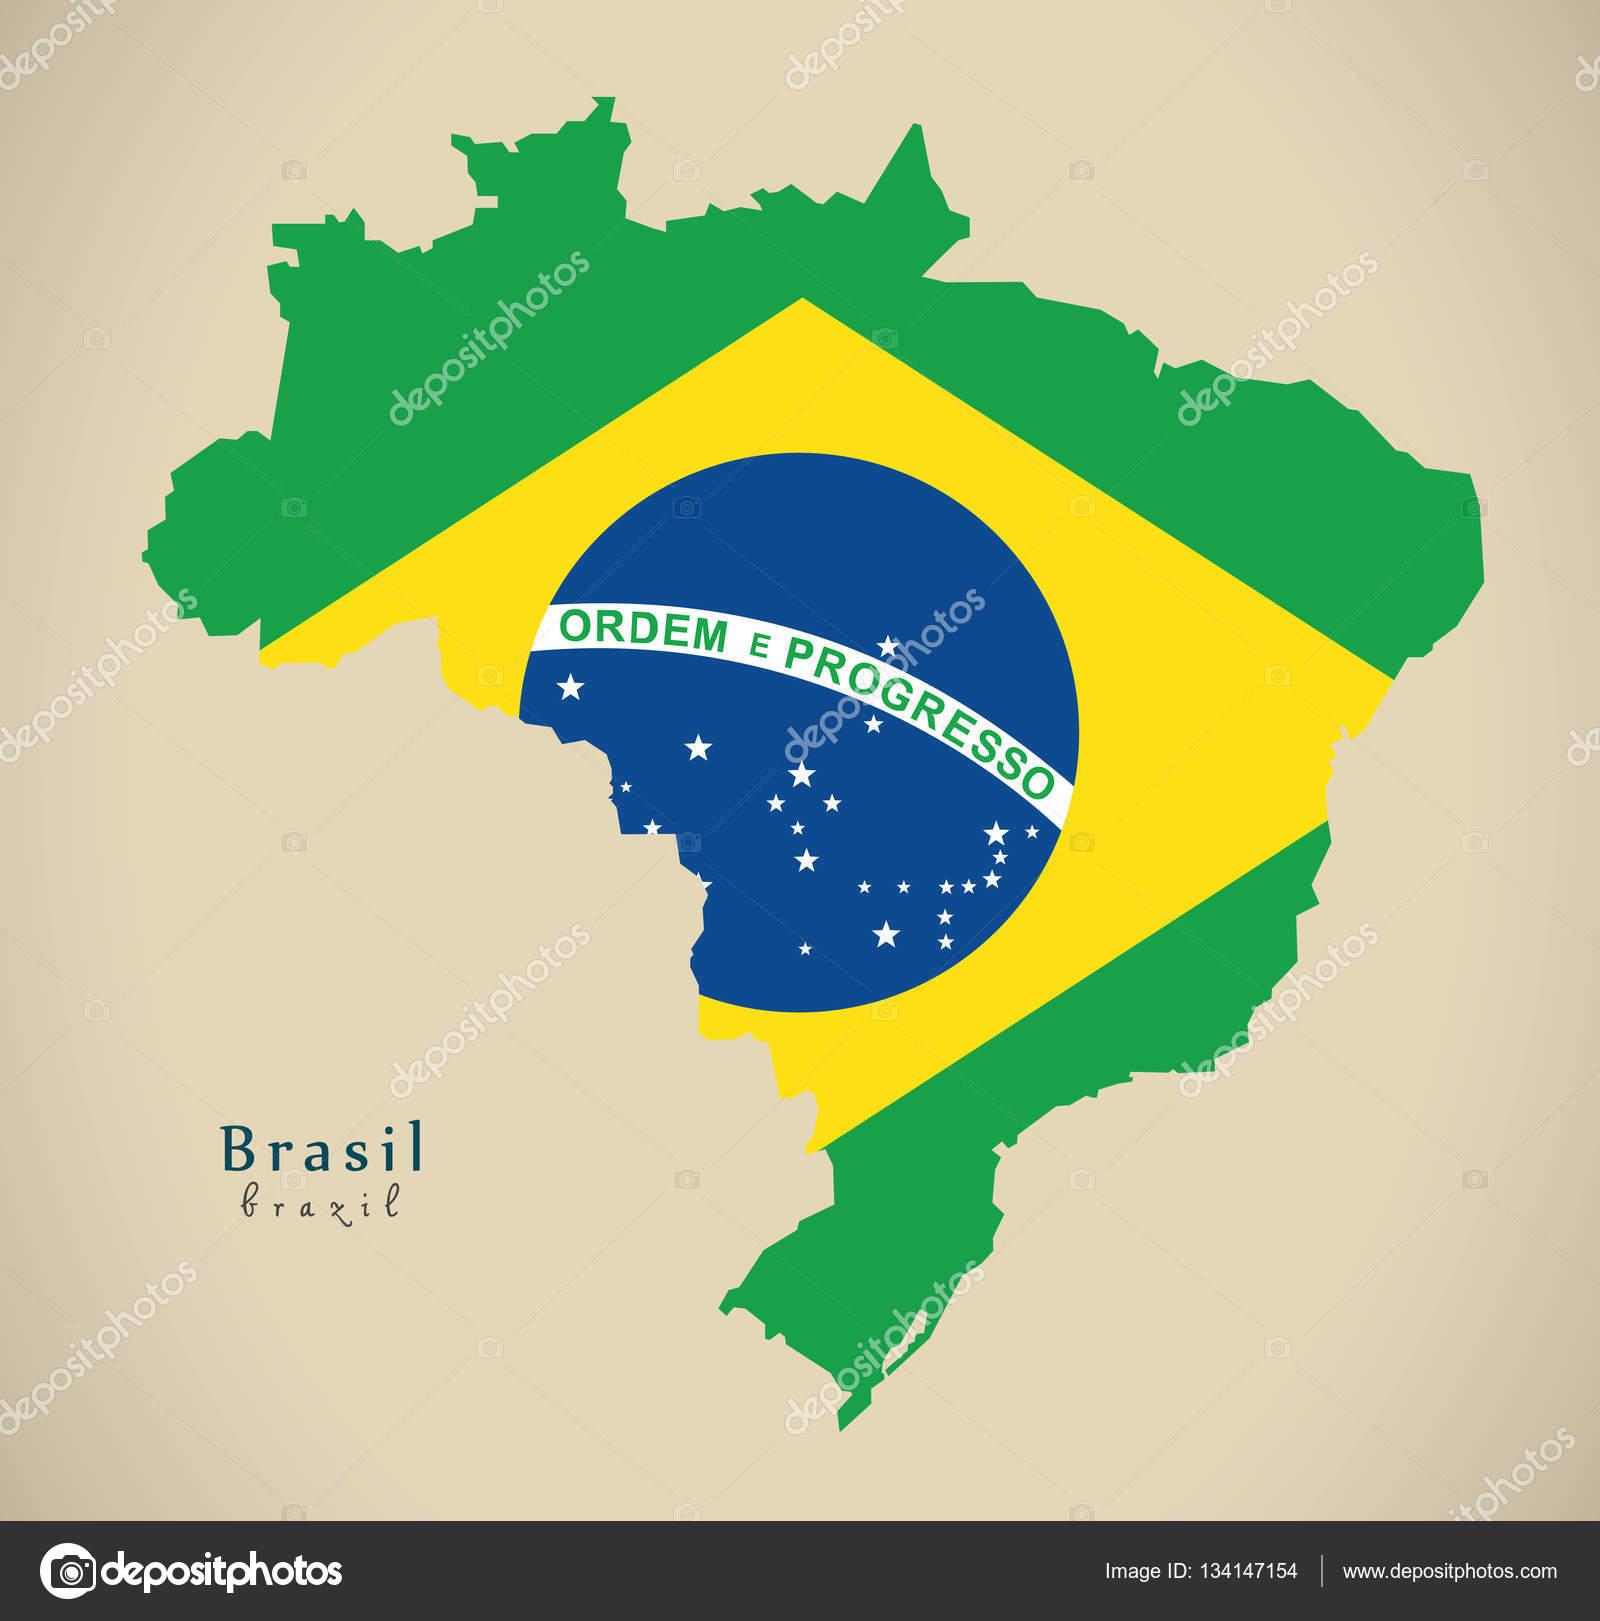 modern map brasil coloured br brazil \u2014 stock photo © ingomenhardmodern map brasil coloured br brazil \u2014 stock photo